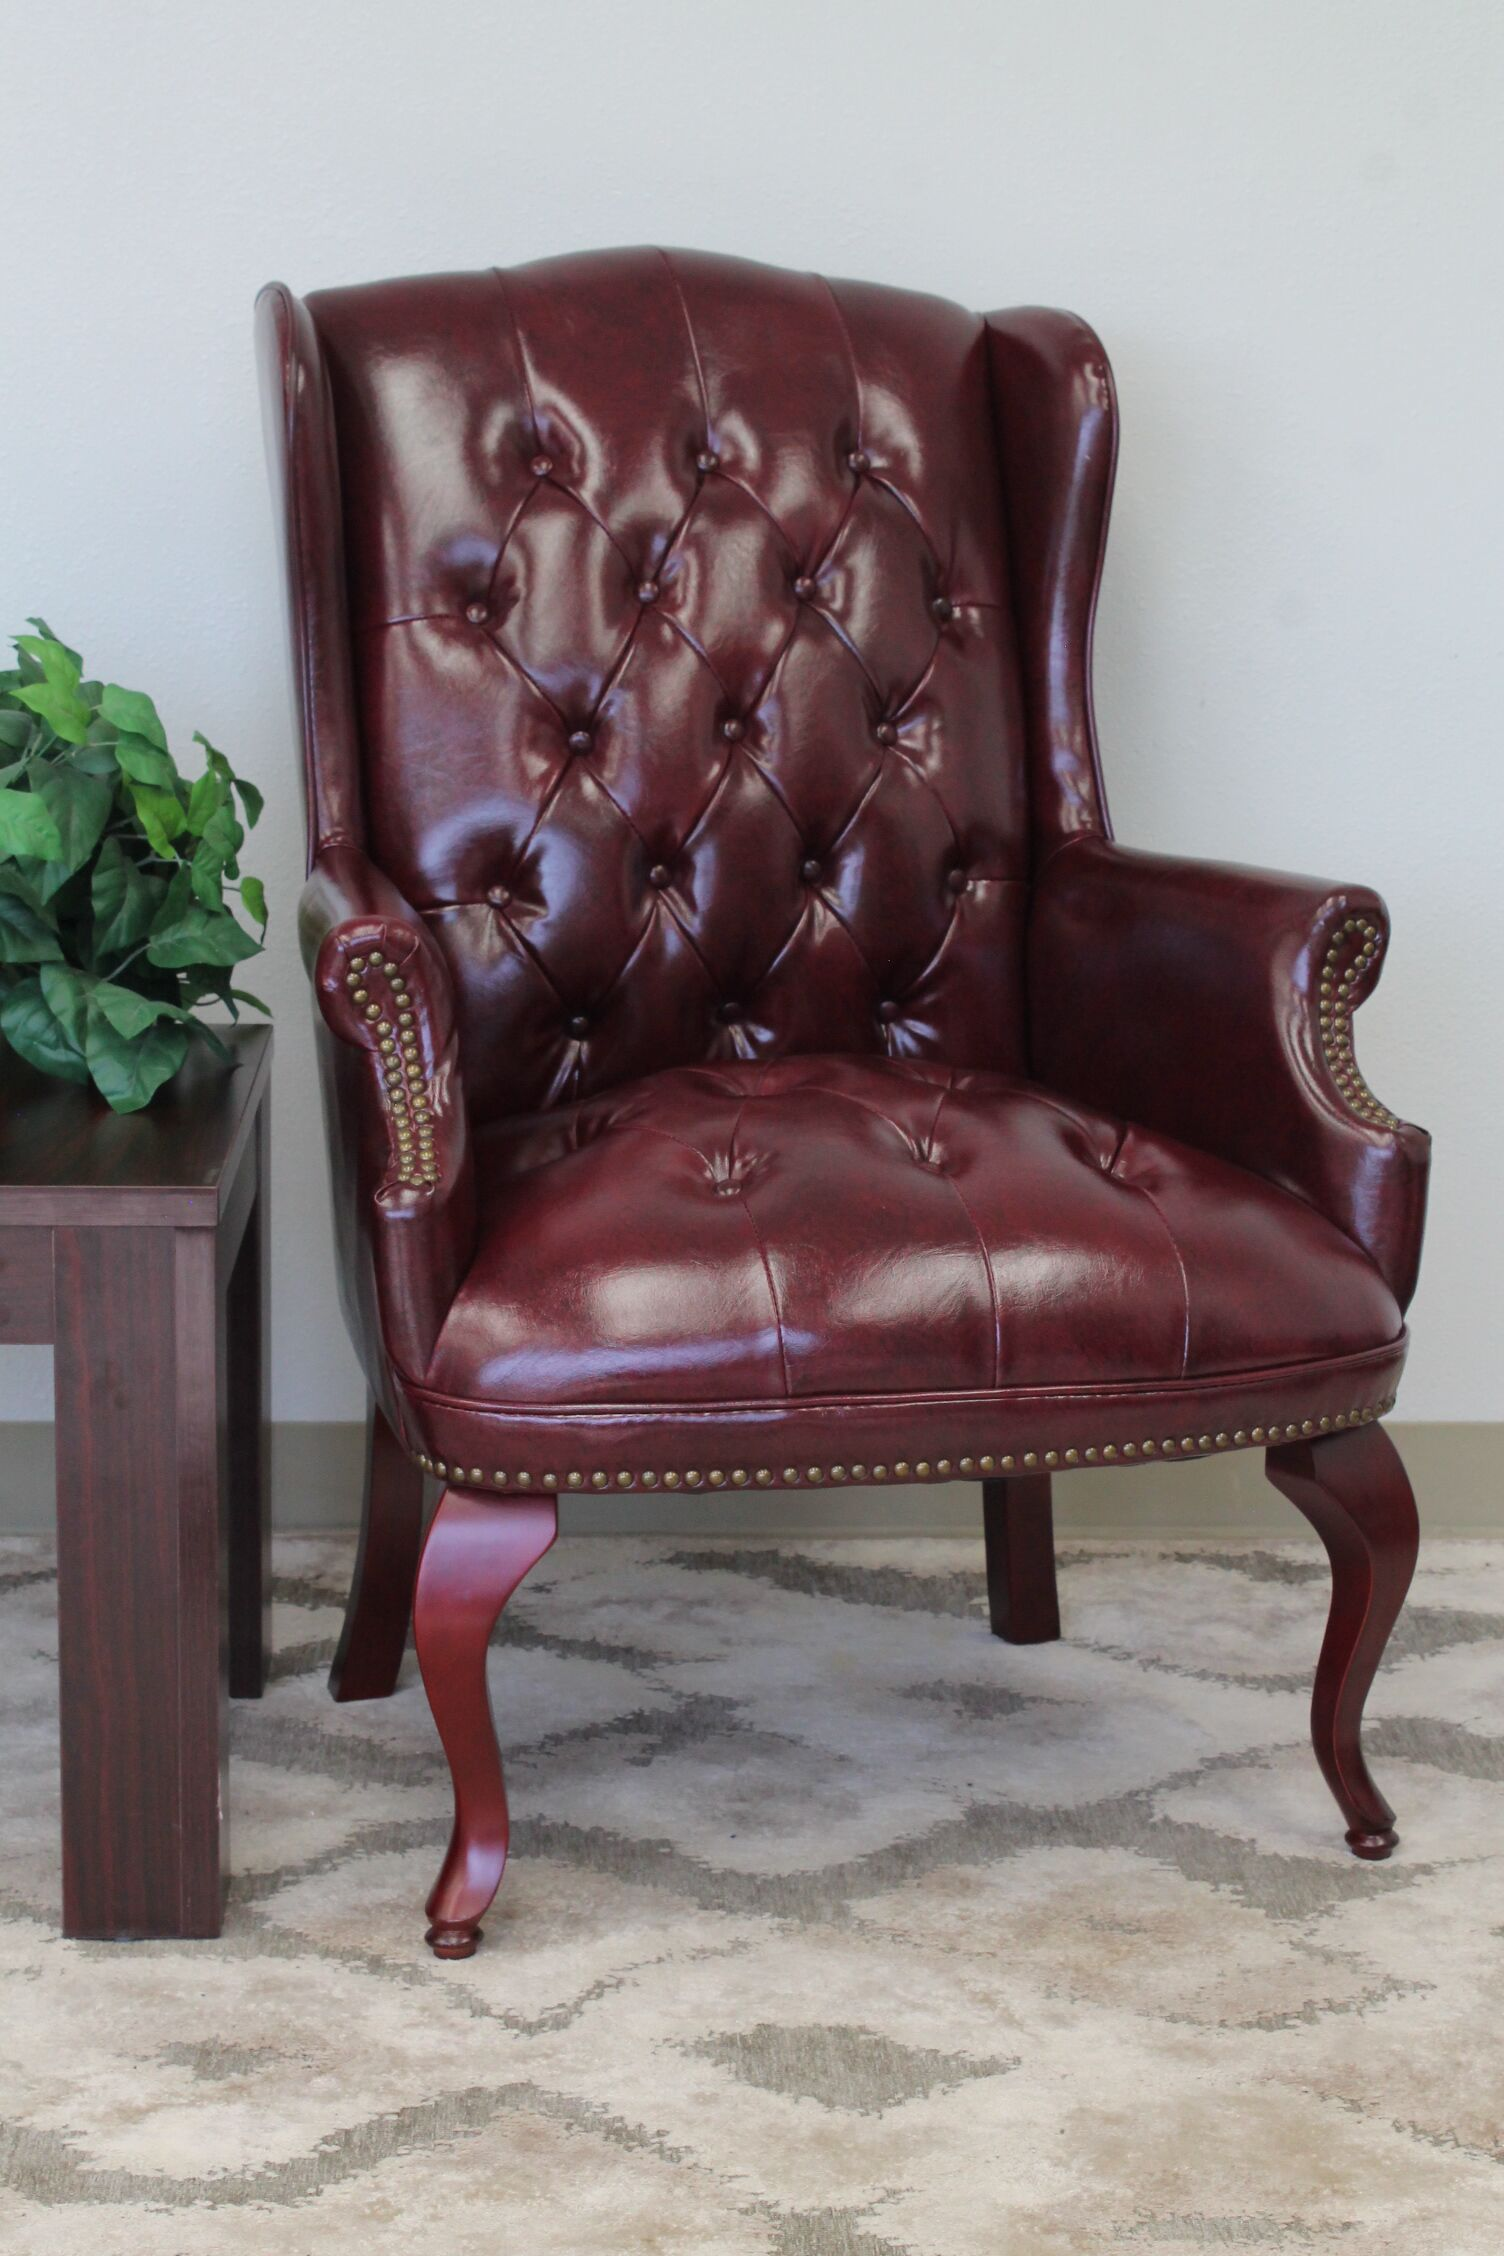 Sedgemoor Traditional Series Lounge Chair Upholstery: Oxblood Vinyl